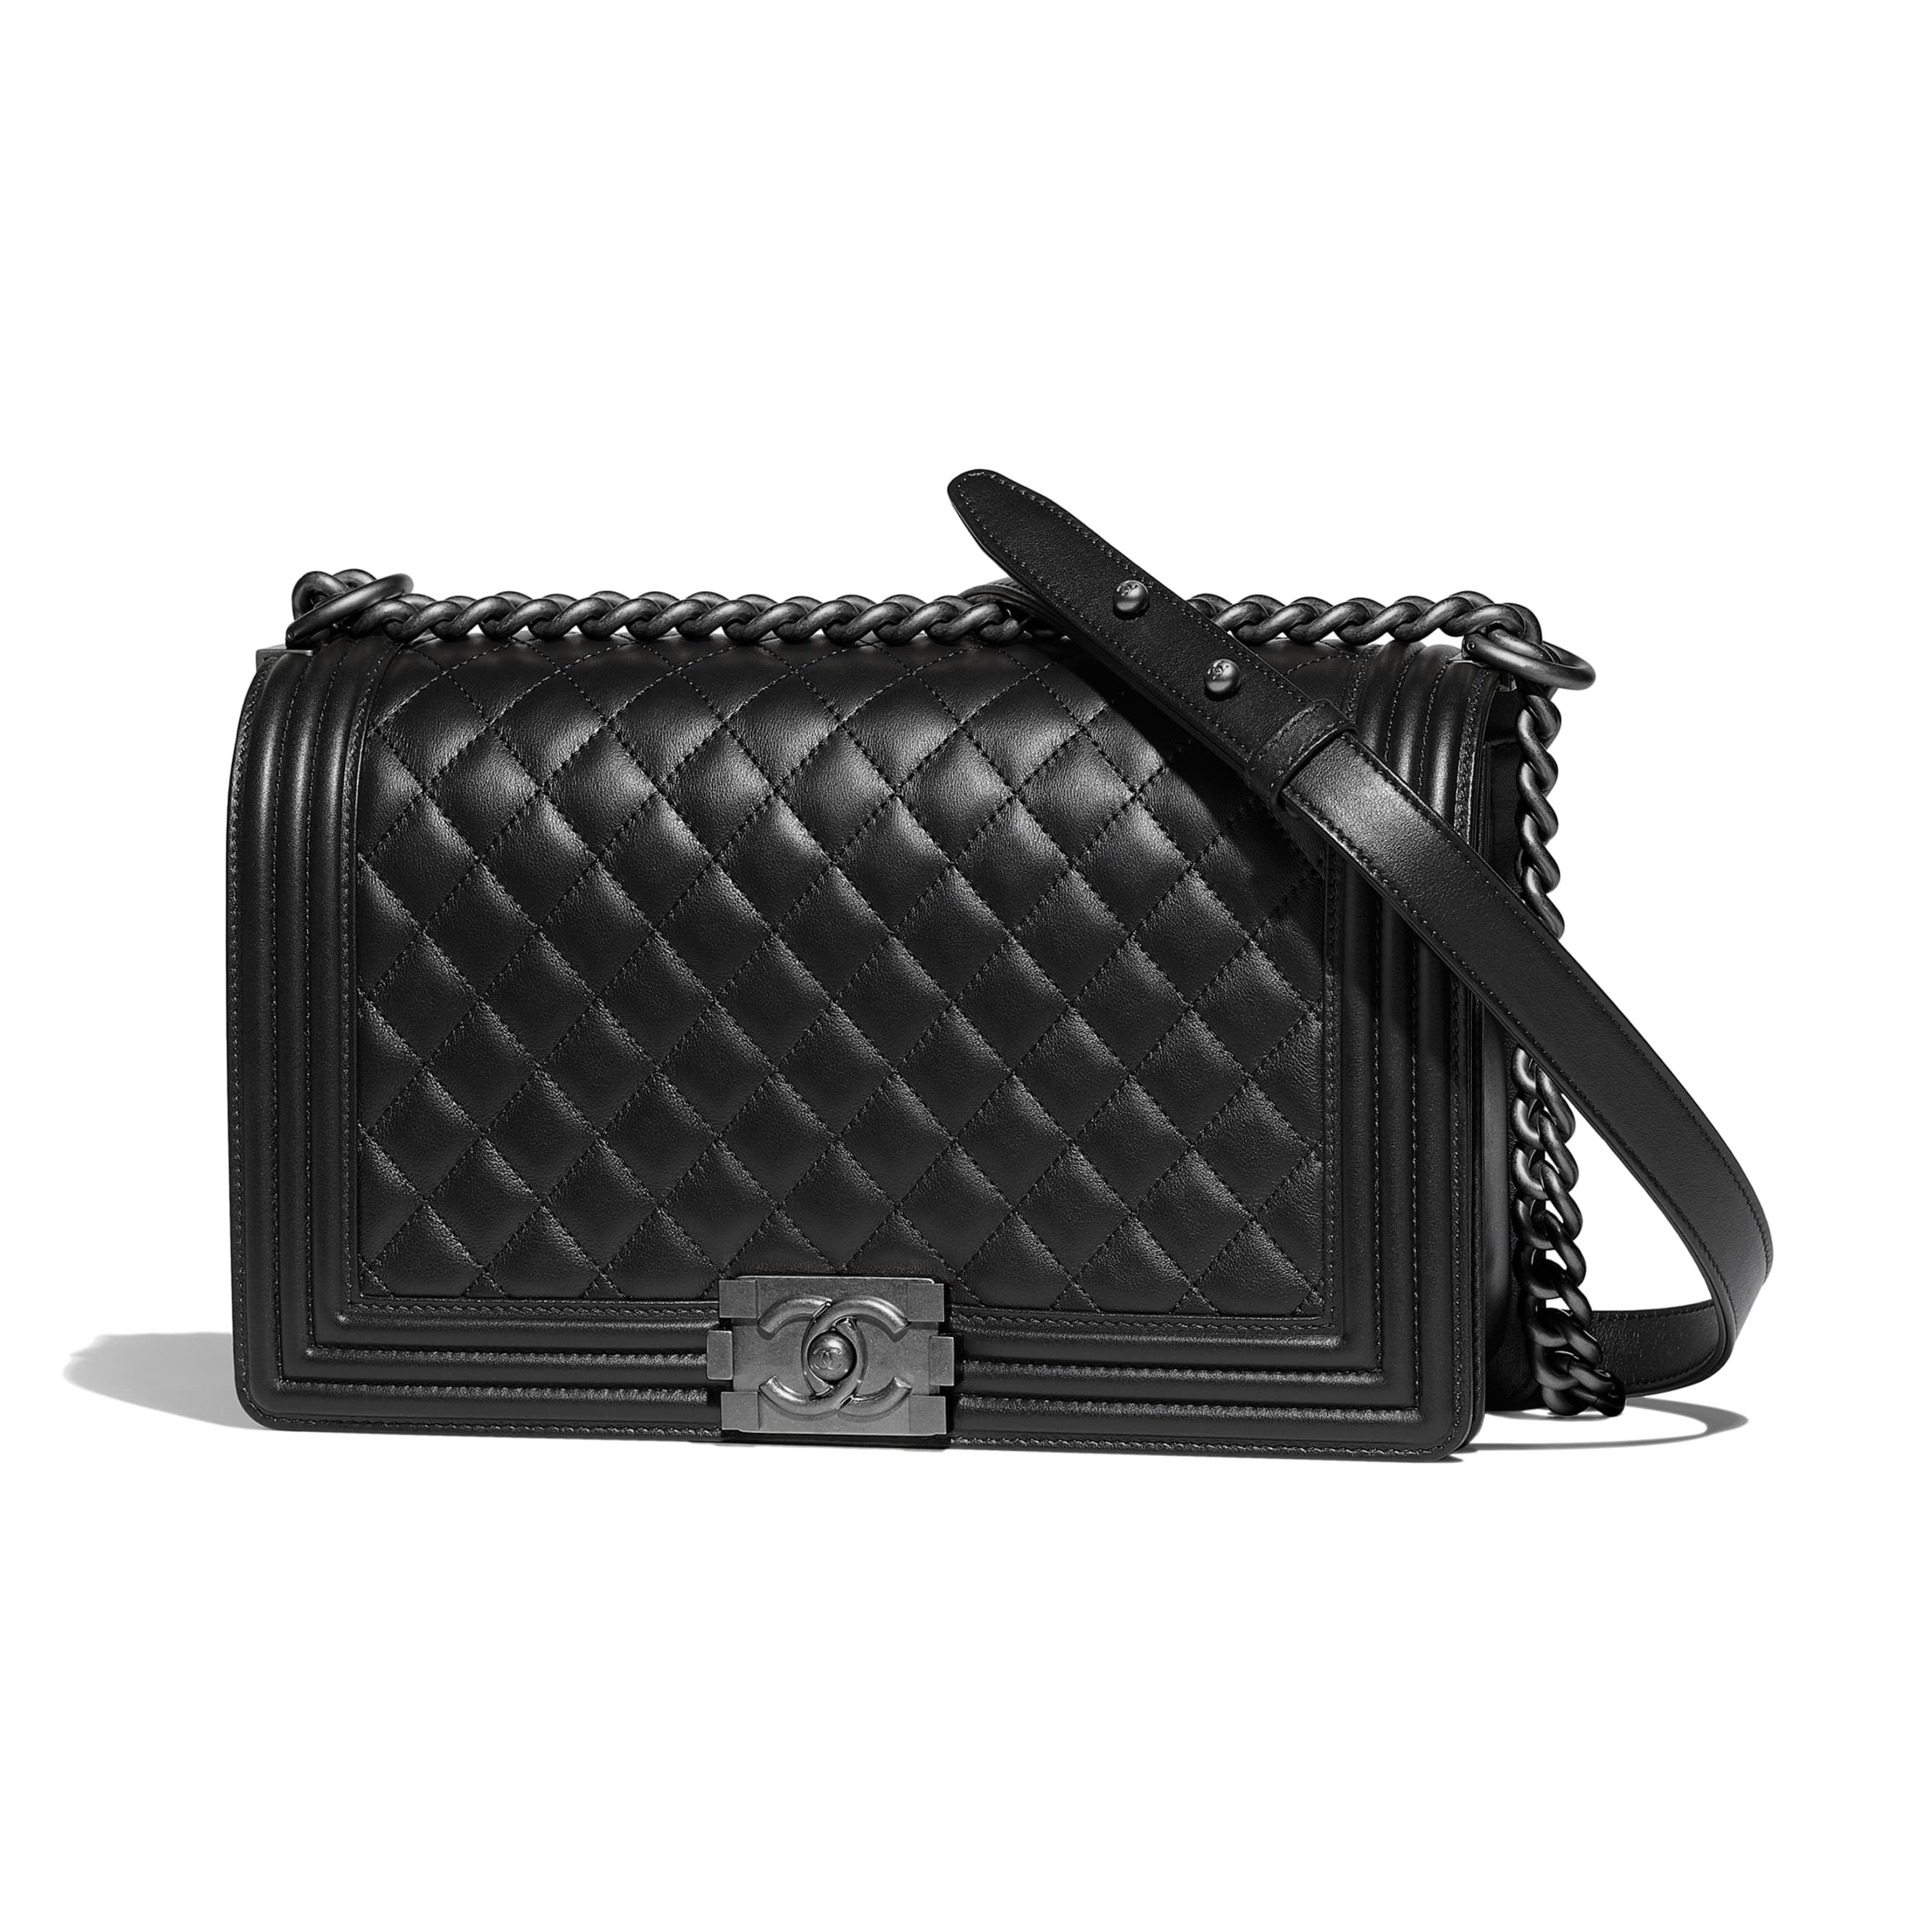 c020f1279a4b7 Large BOY CHANEL Handbag - Black - Calfskin & Ruthenium-Finish Metal -  Default view - see standard sized version